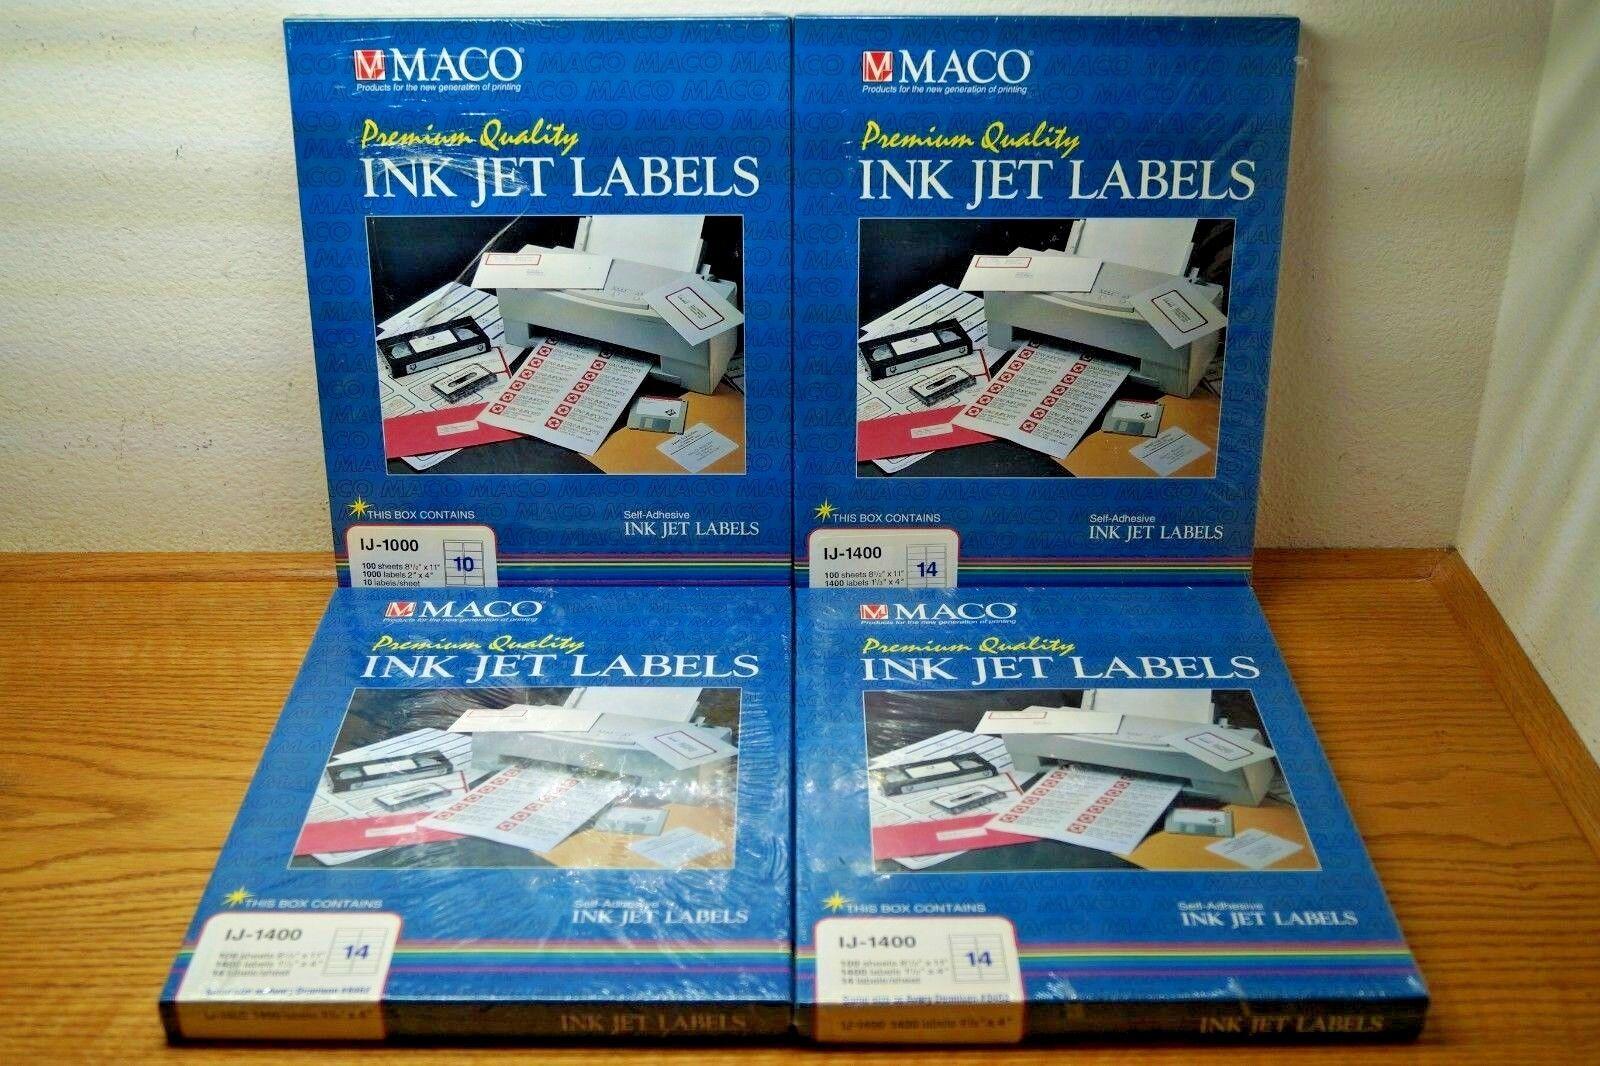 MACO INK JET IJ-1000 & IJ-1400 LABELS PER BOX NEW SEALED SELF ADHESIVE LOT OF 4